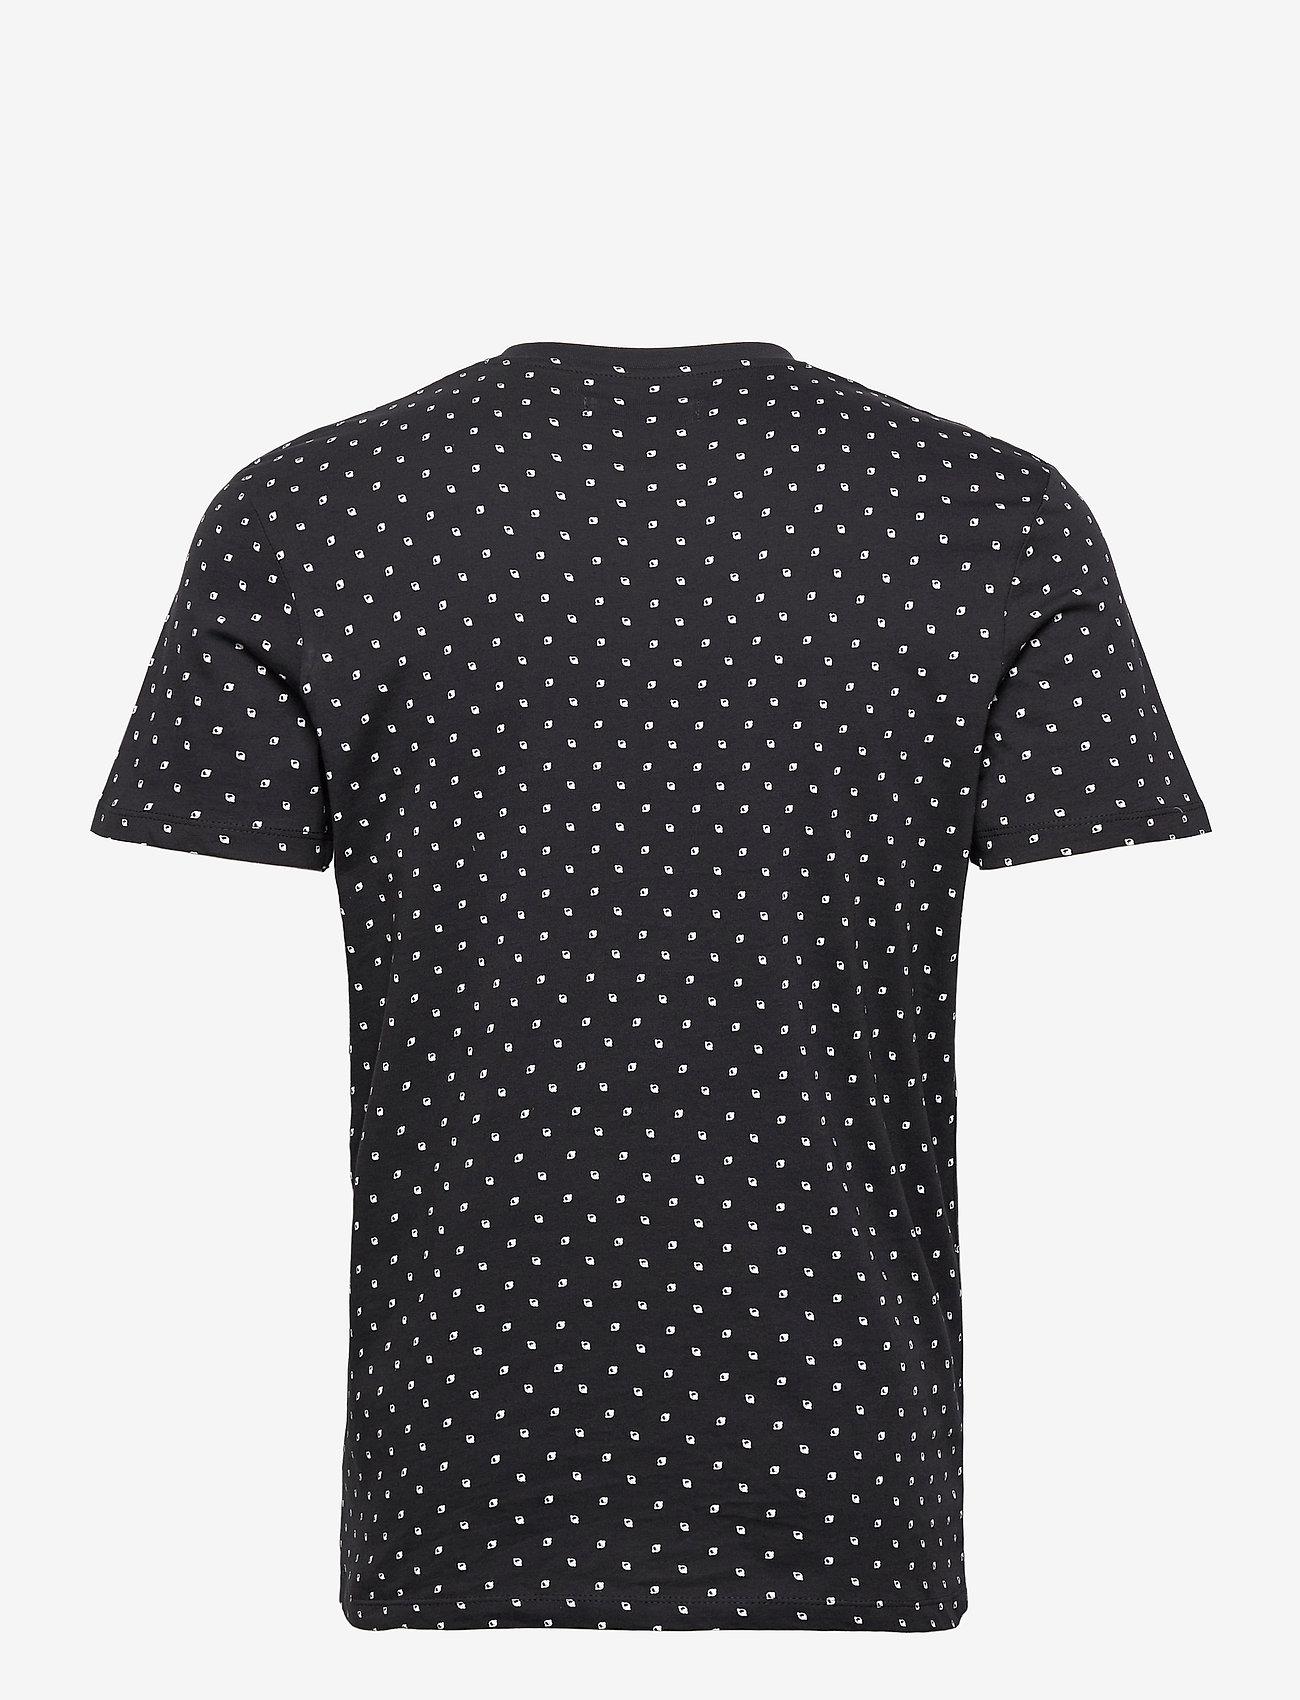 Jack & Jones - JJMINIMAL AOP TEE SS CREW NECK - kortärmade t-shirts - dark navy - 1